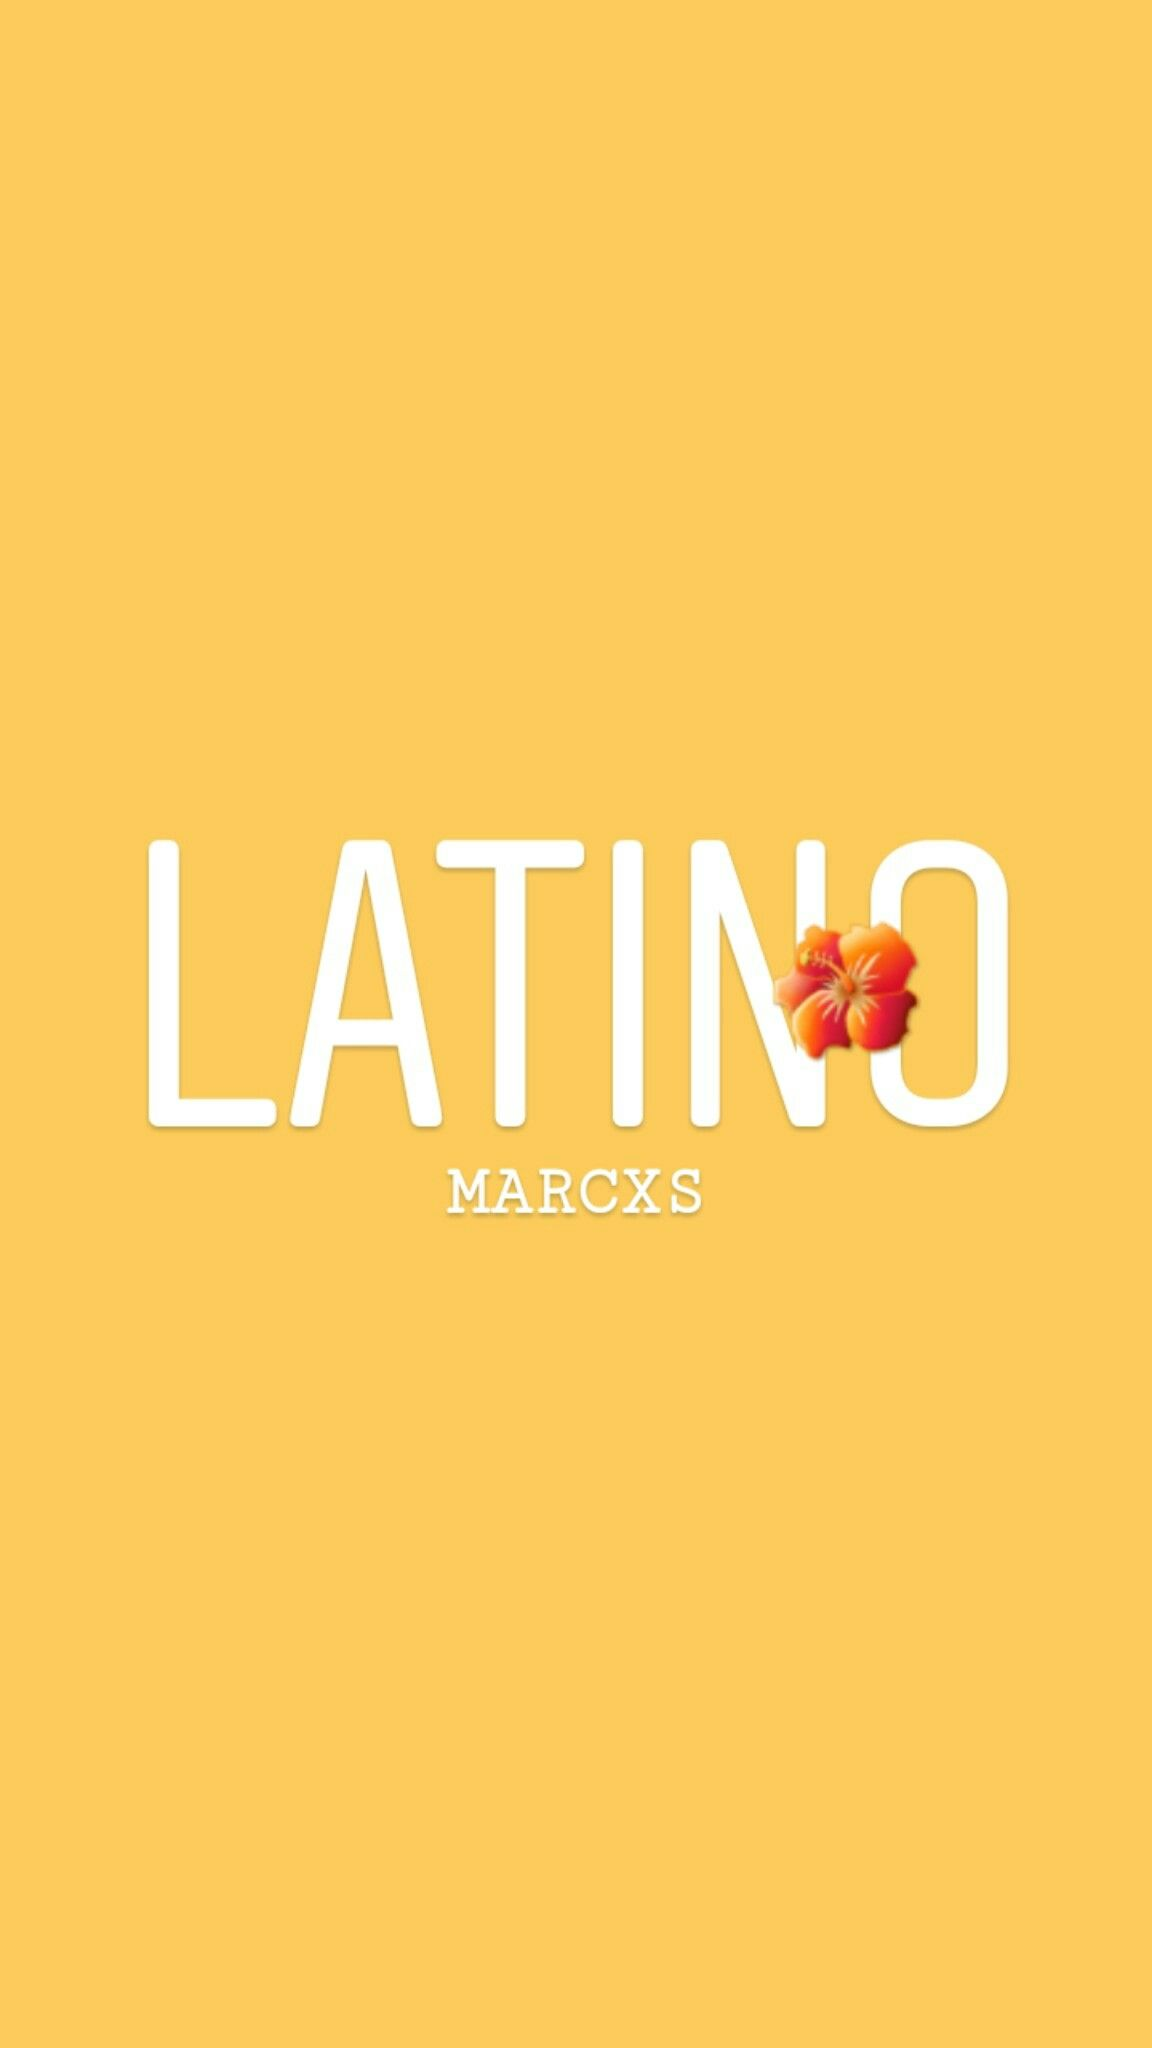 Latino Wallpaper Tumblr Instagram Story Background Latino Wallpaper Mexico Wallpaper